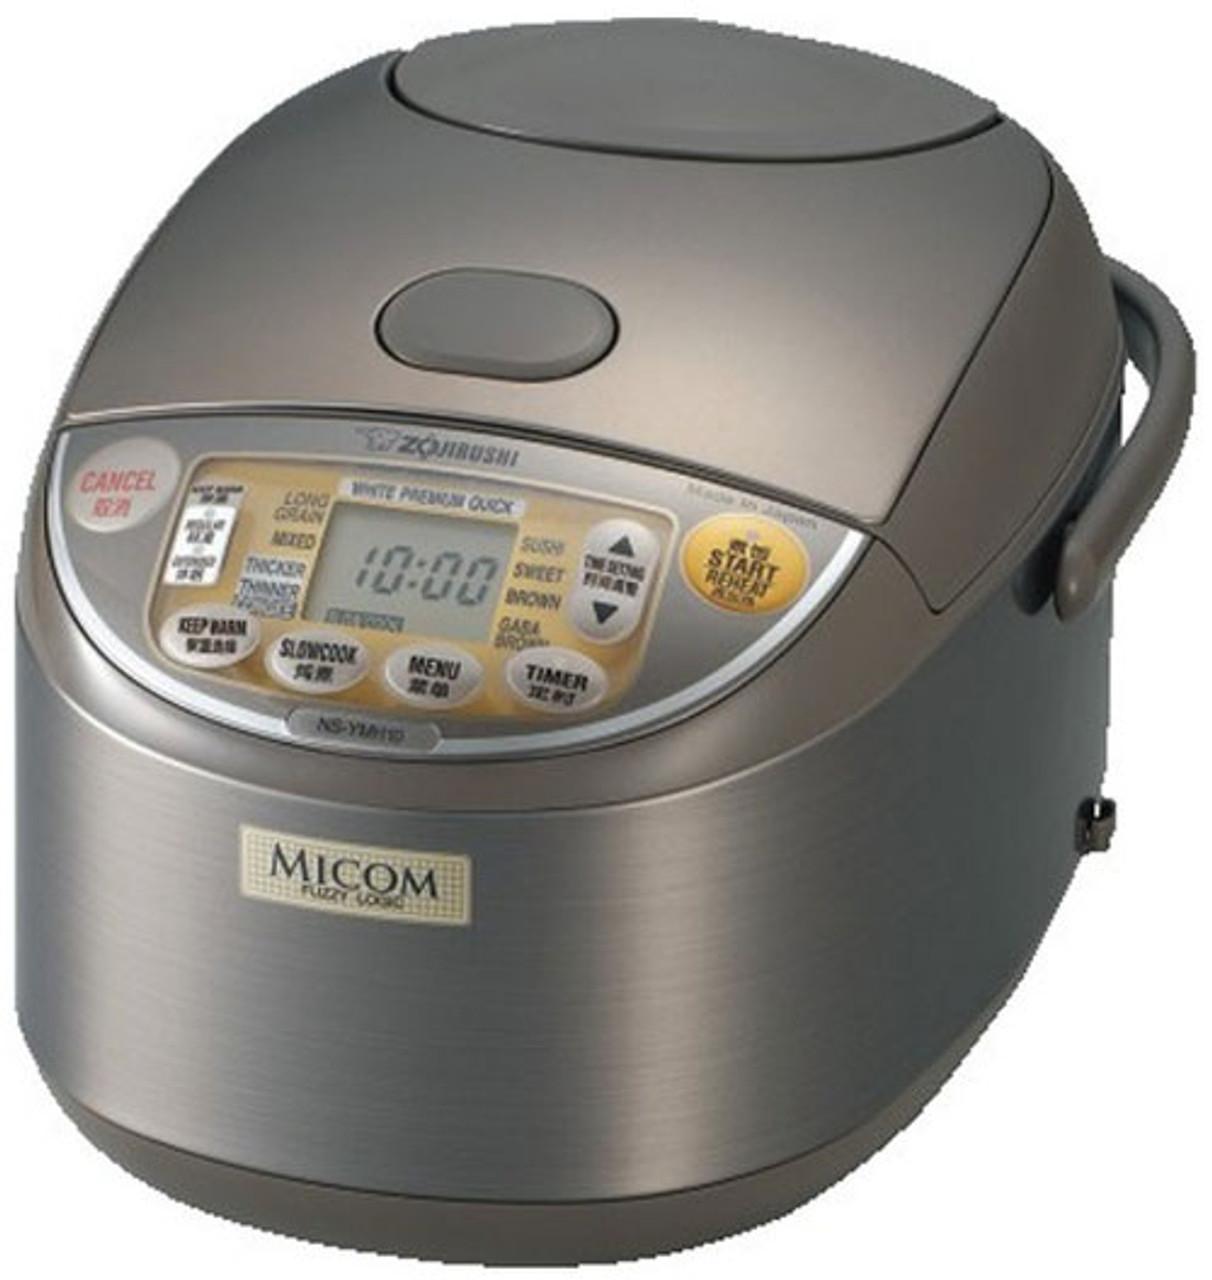 Zojirushi Rice Cooker NS-YMH10 220-230V